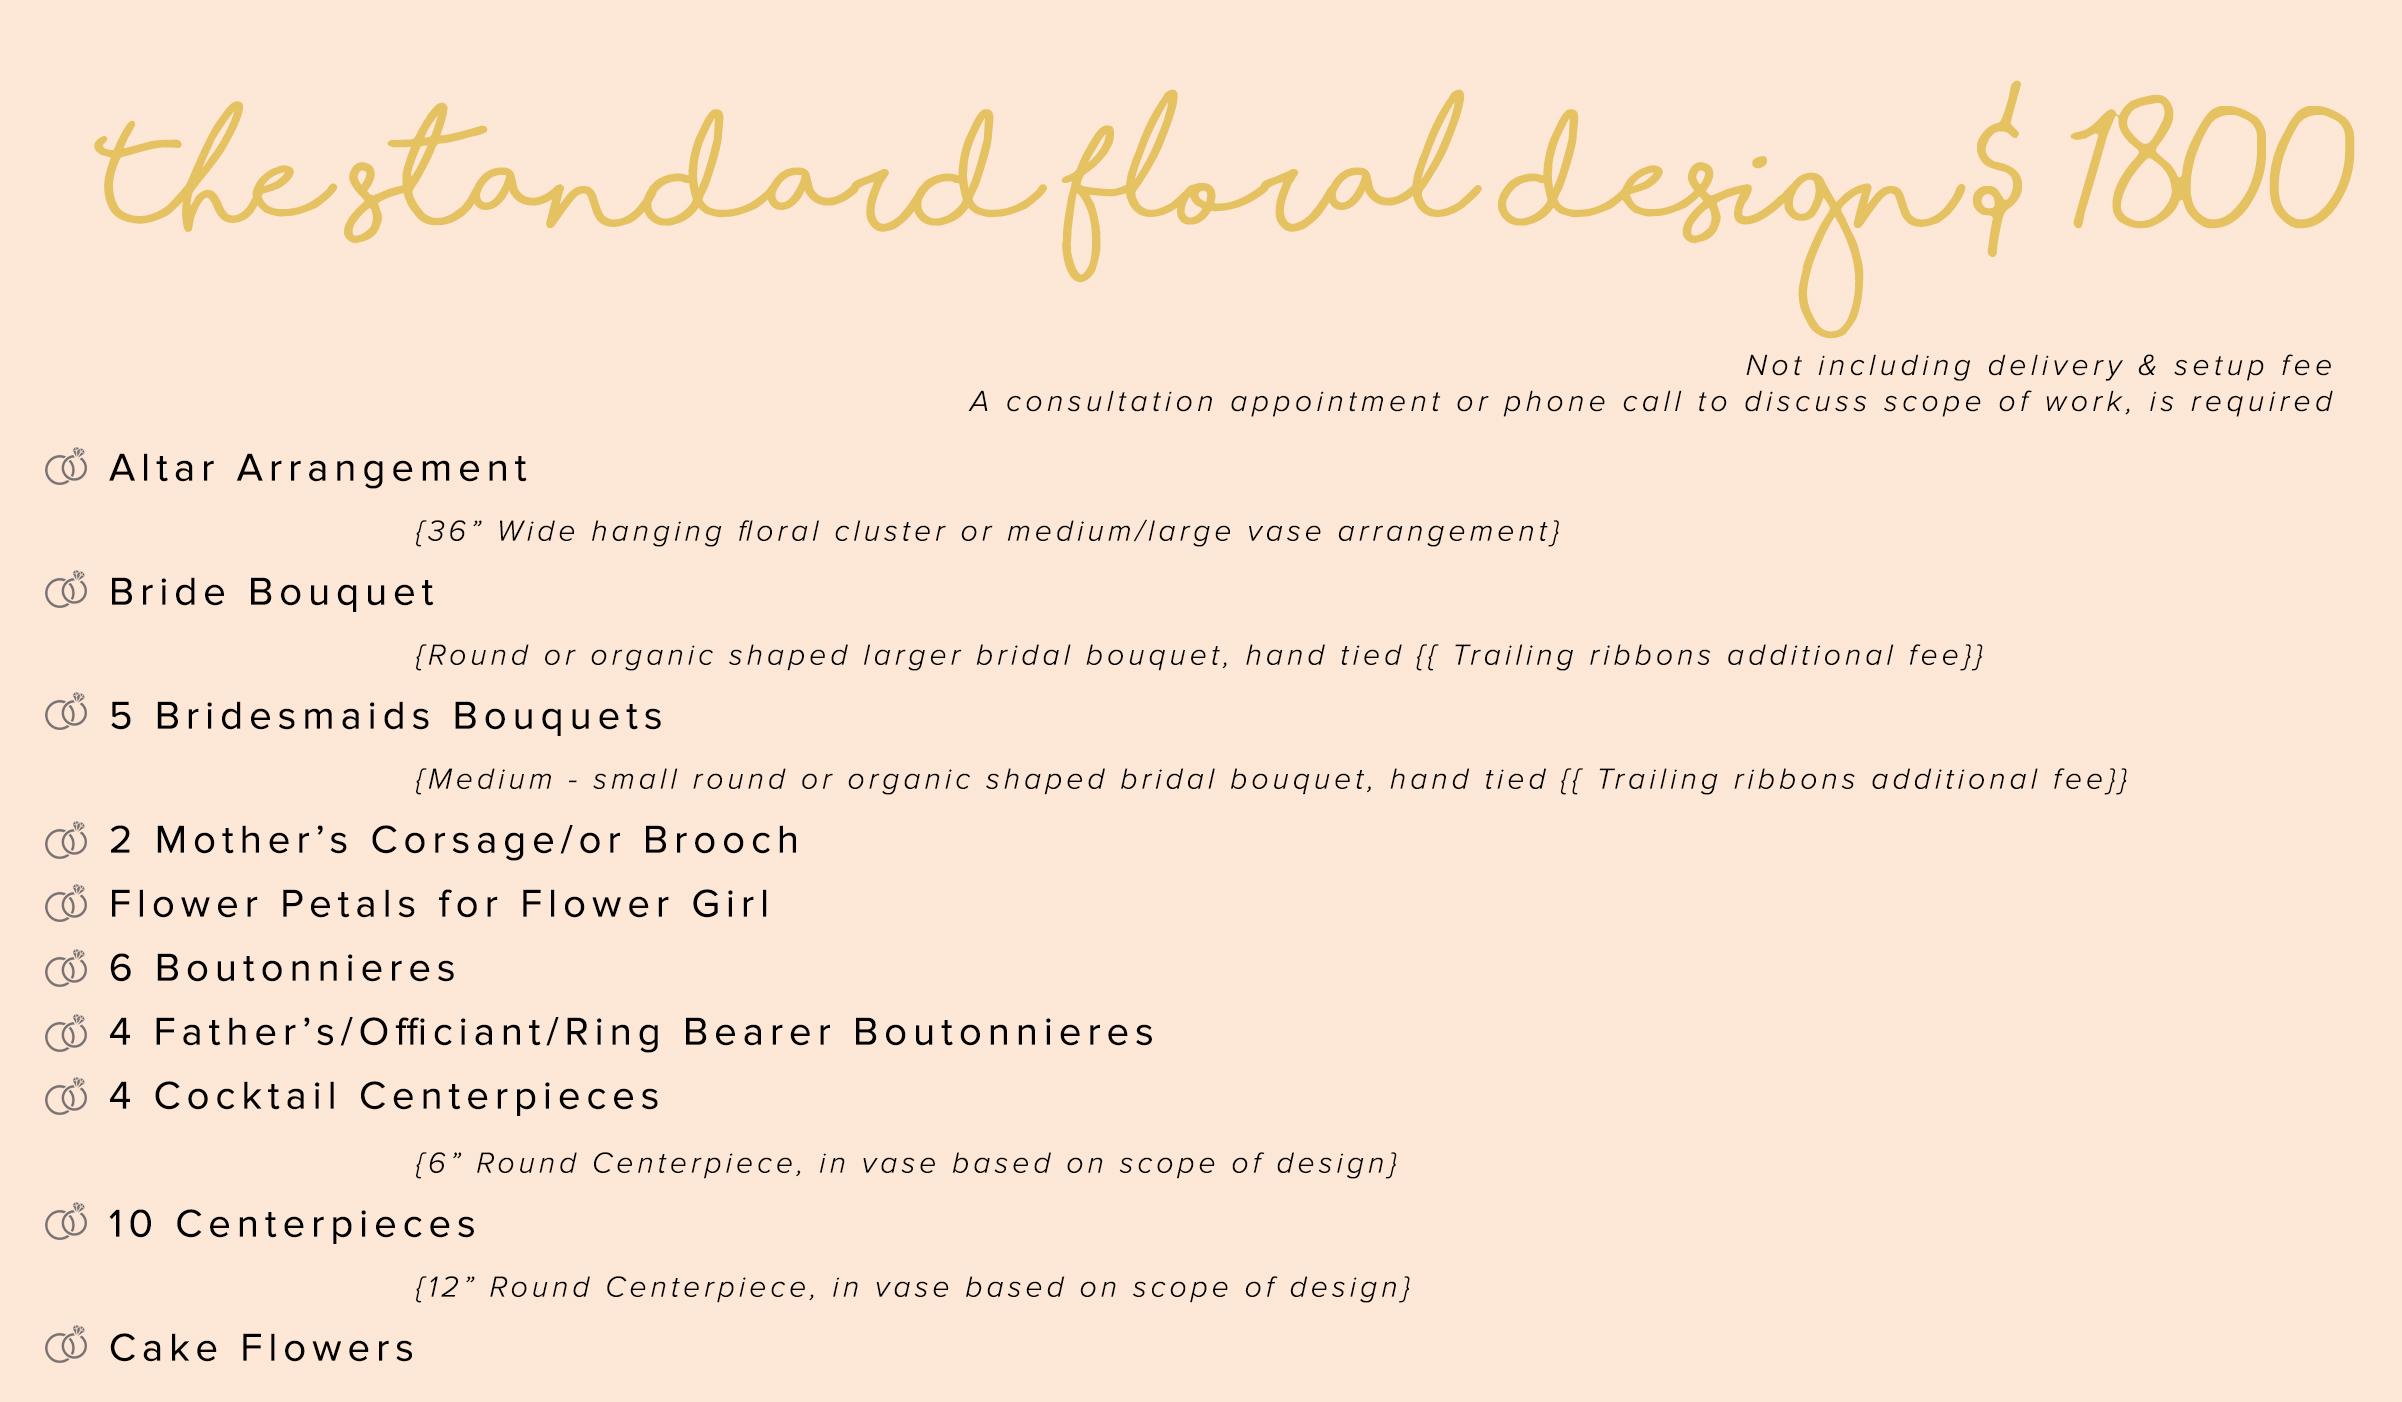 wedding_the_standard_floral_design.jpg